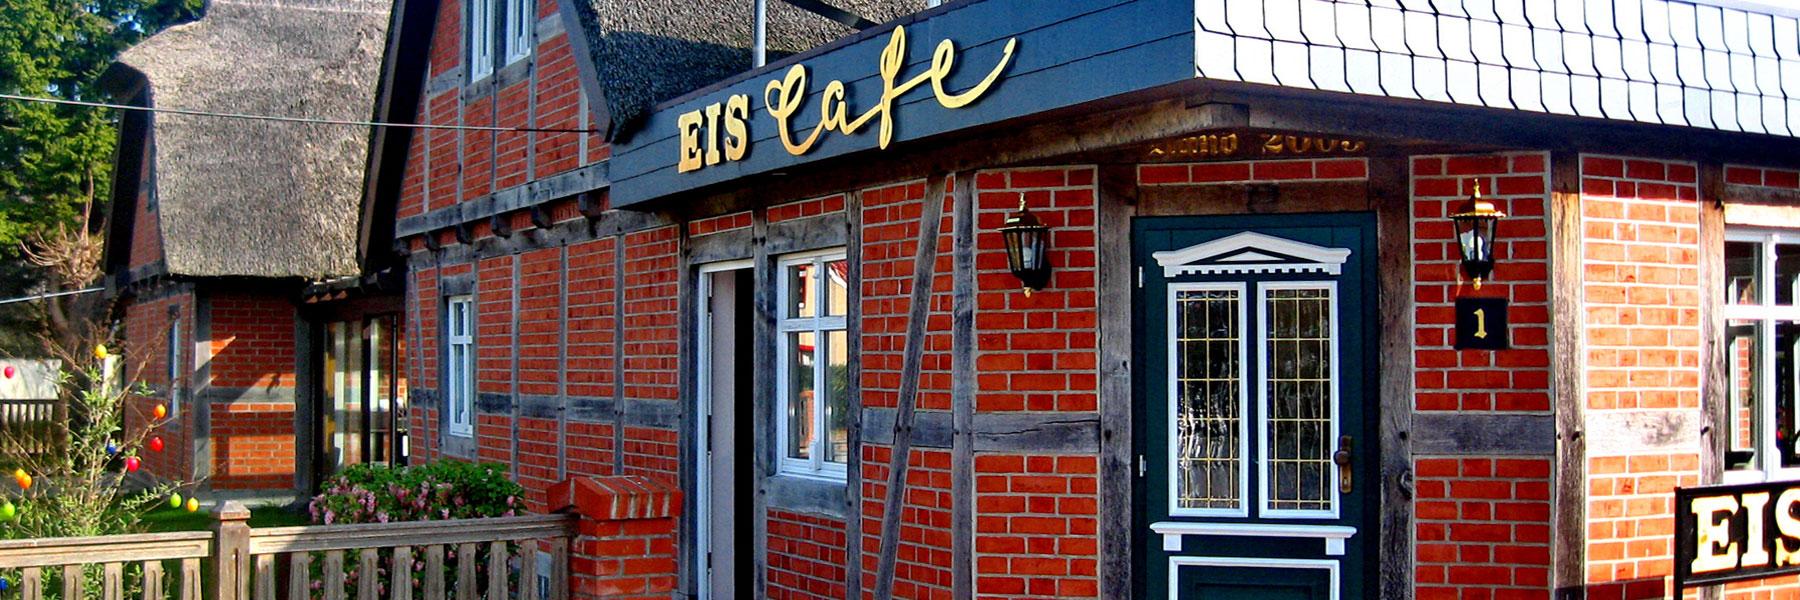 Eingang Café - Eis-Café Schumann & Pension